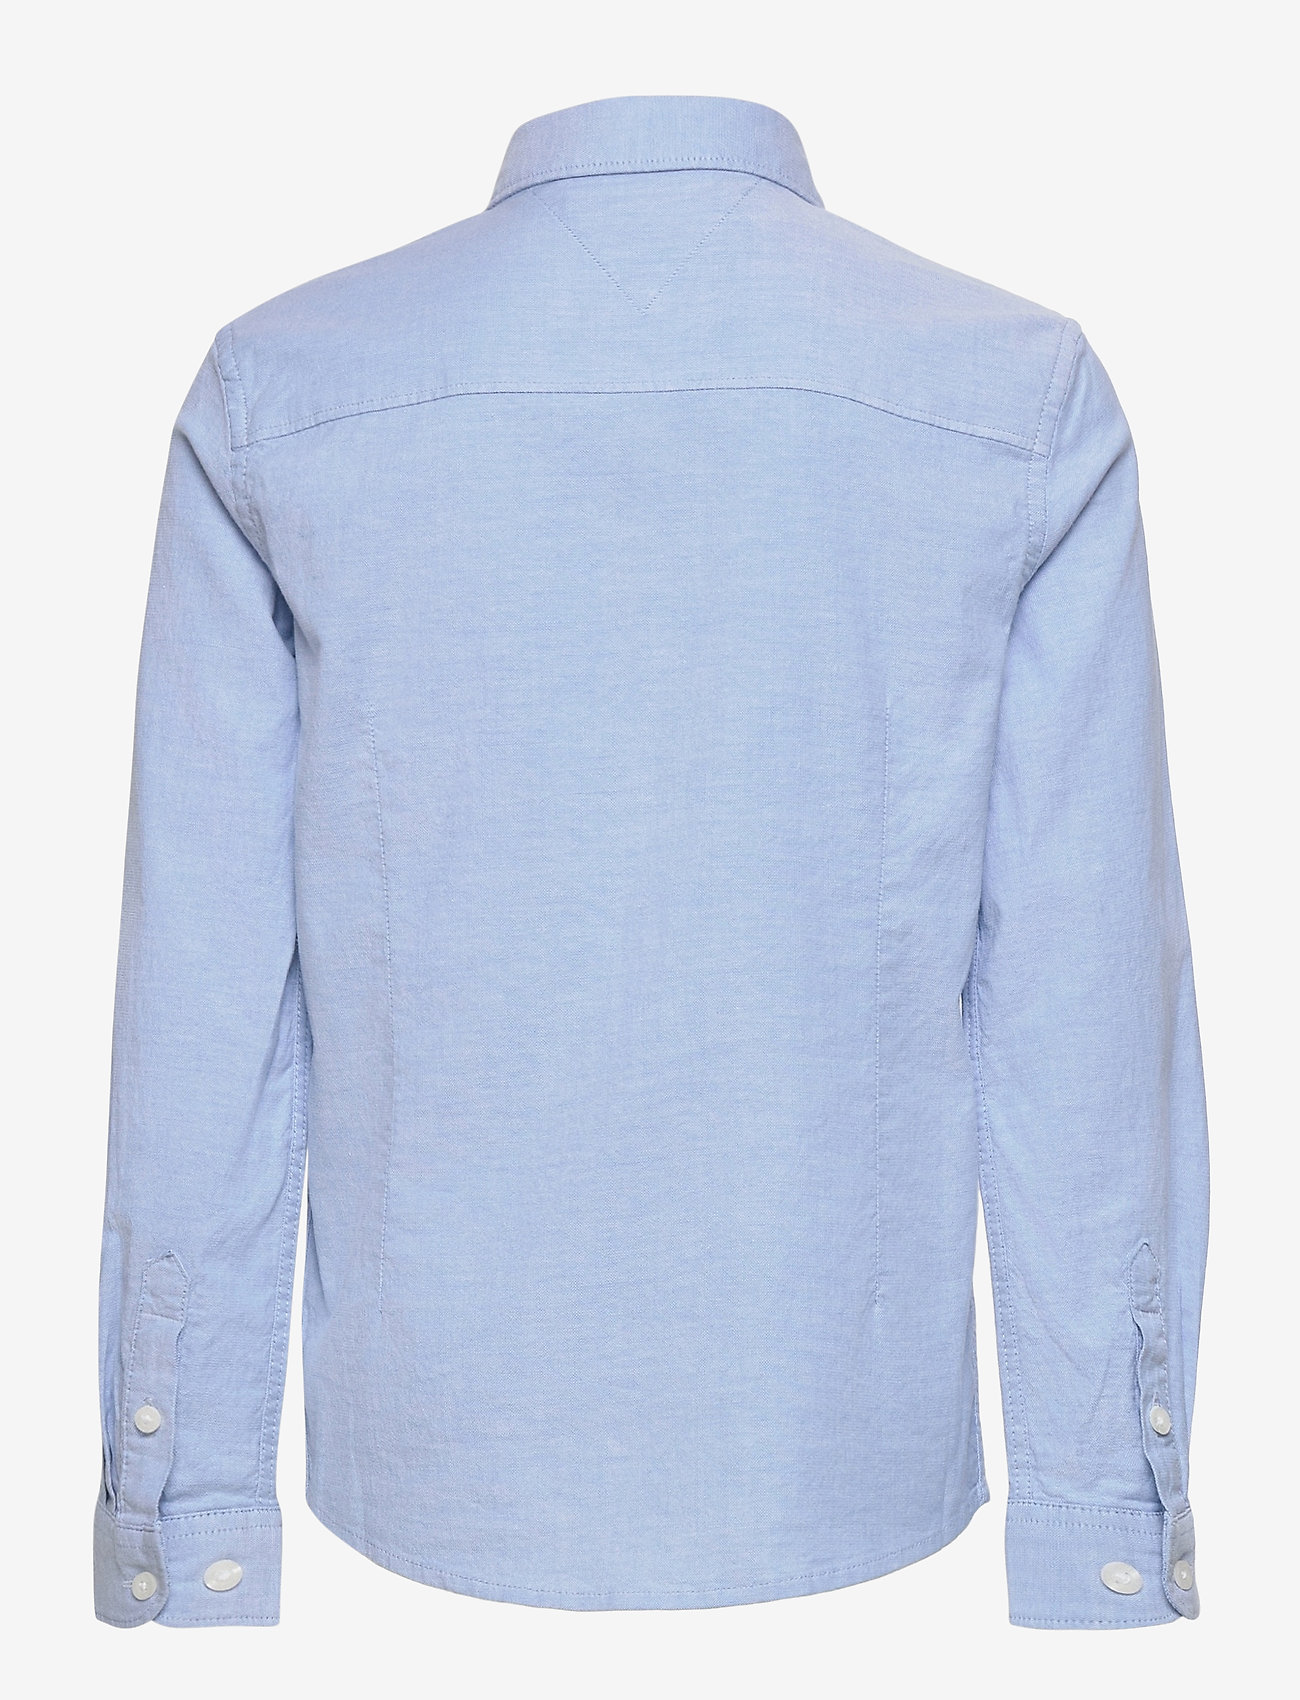 Tommy Hilfiger - BOYS STRETCH OXFORD SHIRT L/S - shirts - shirt blue - 1